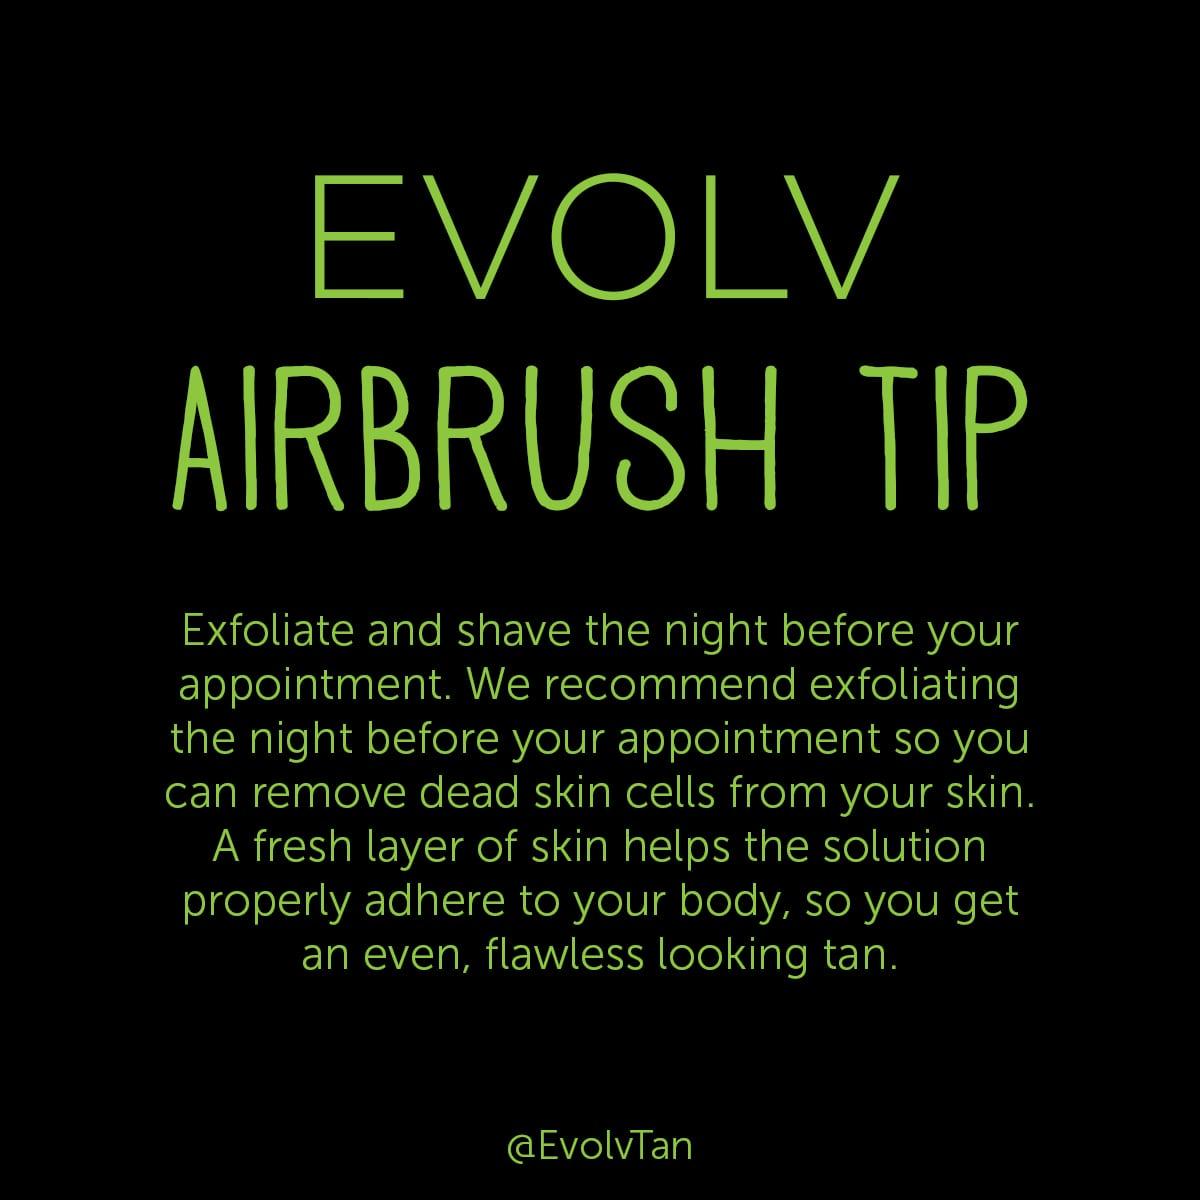 evolv airbrush tip_exfoliate,shave_TW_B